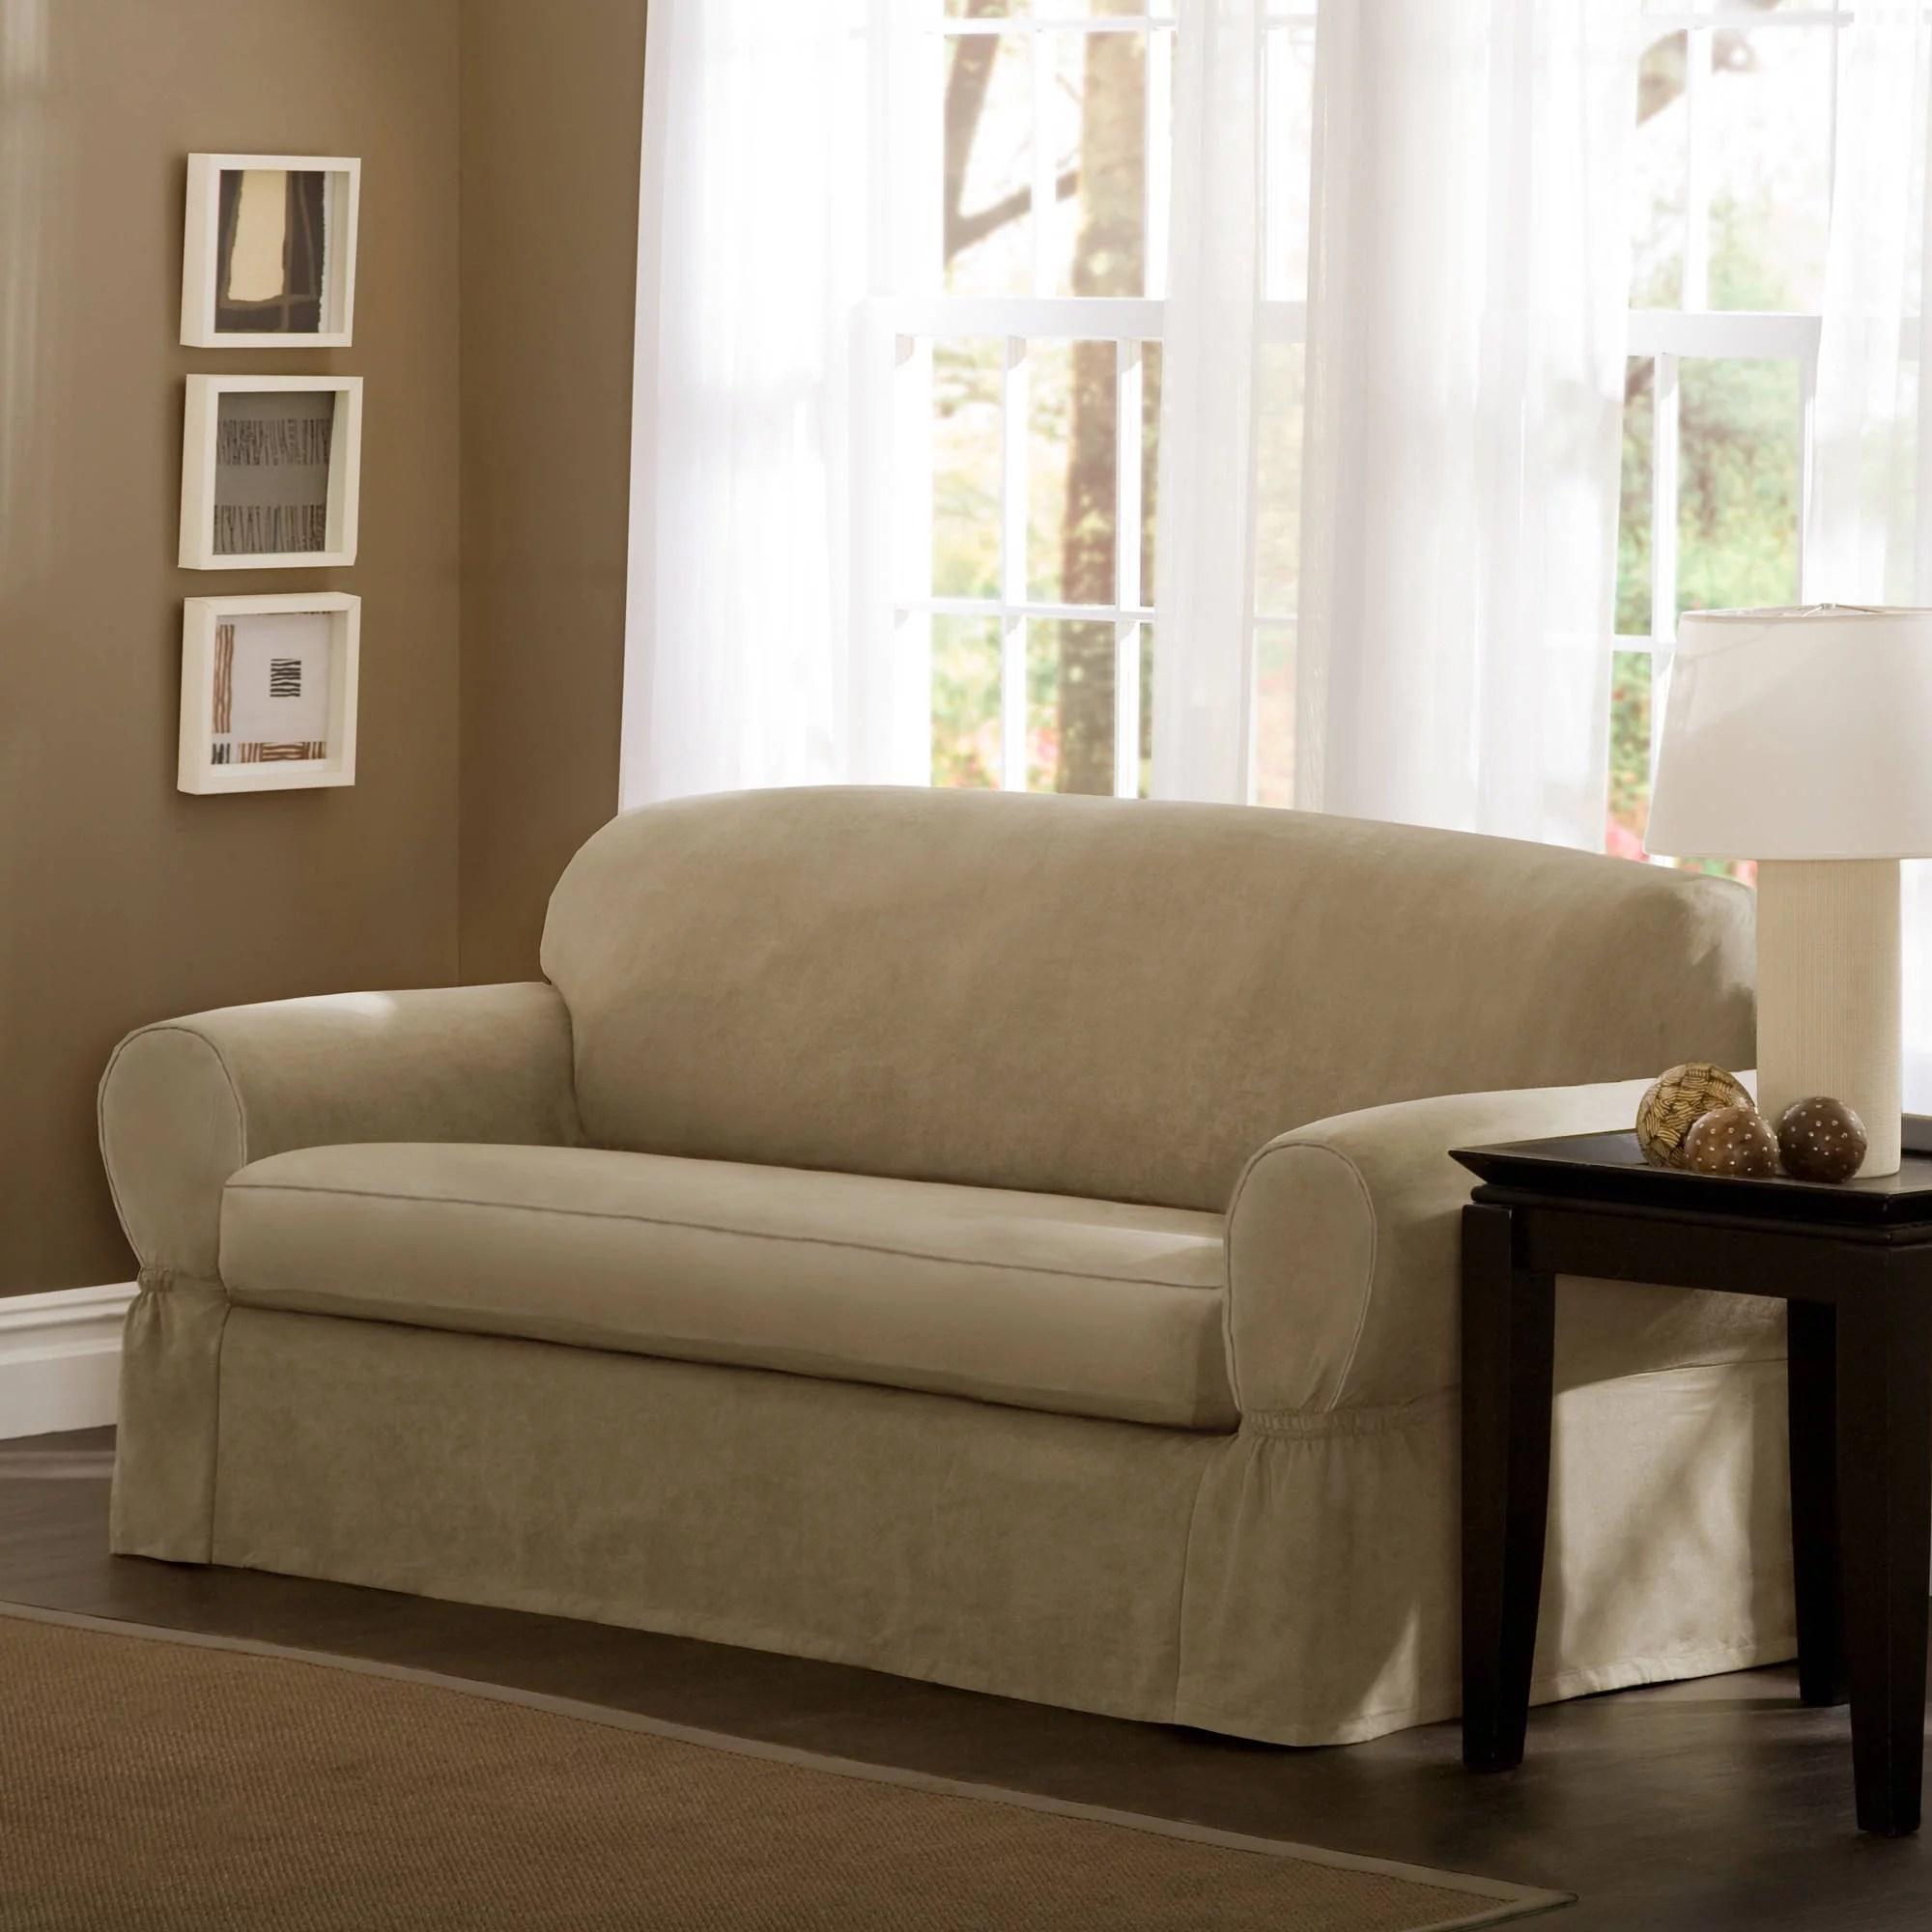 maytex faux suede 2 piece sofa slipcover sand walmart com